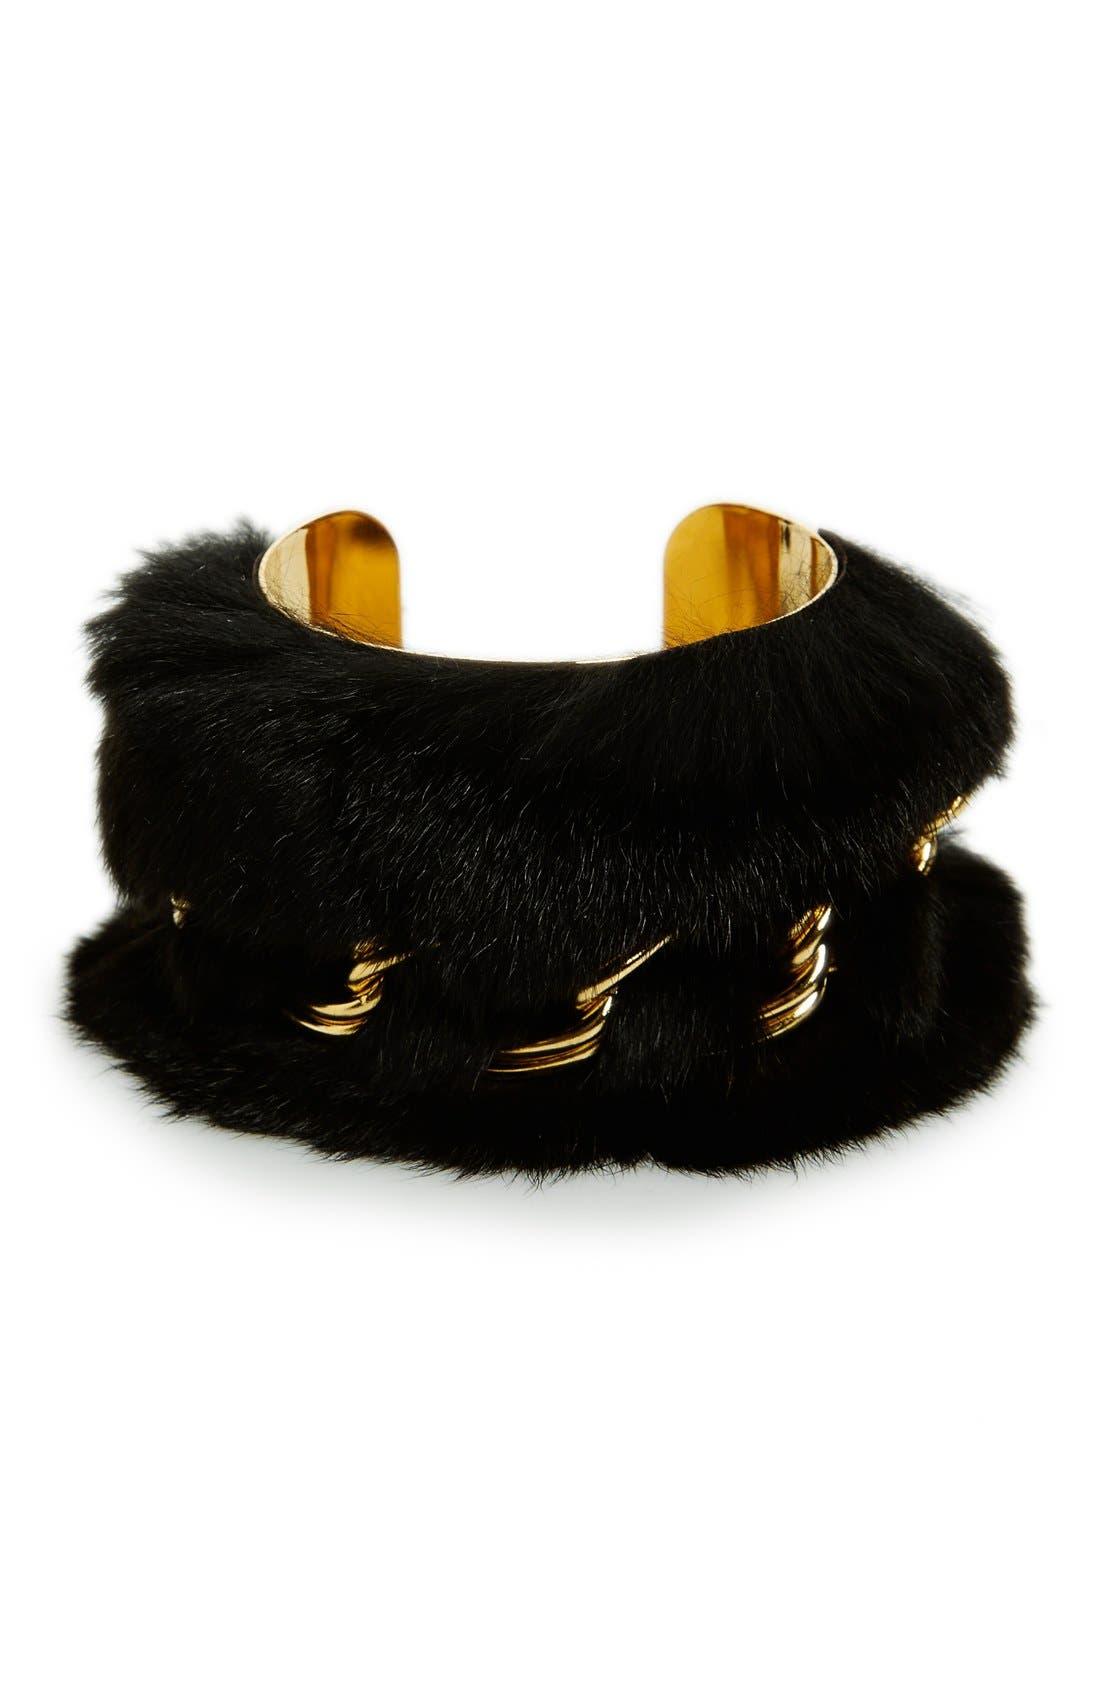 Main Image - Tuleste Genuine Rabbit Fur & Chain Wide Cuff